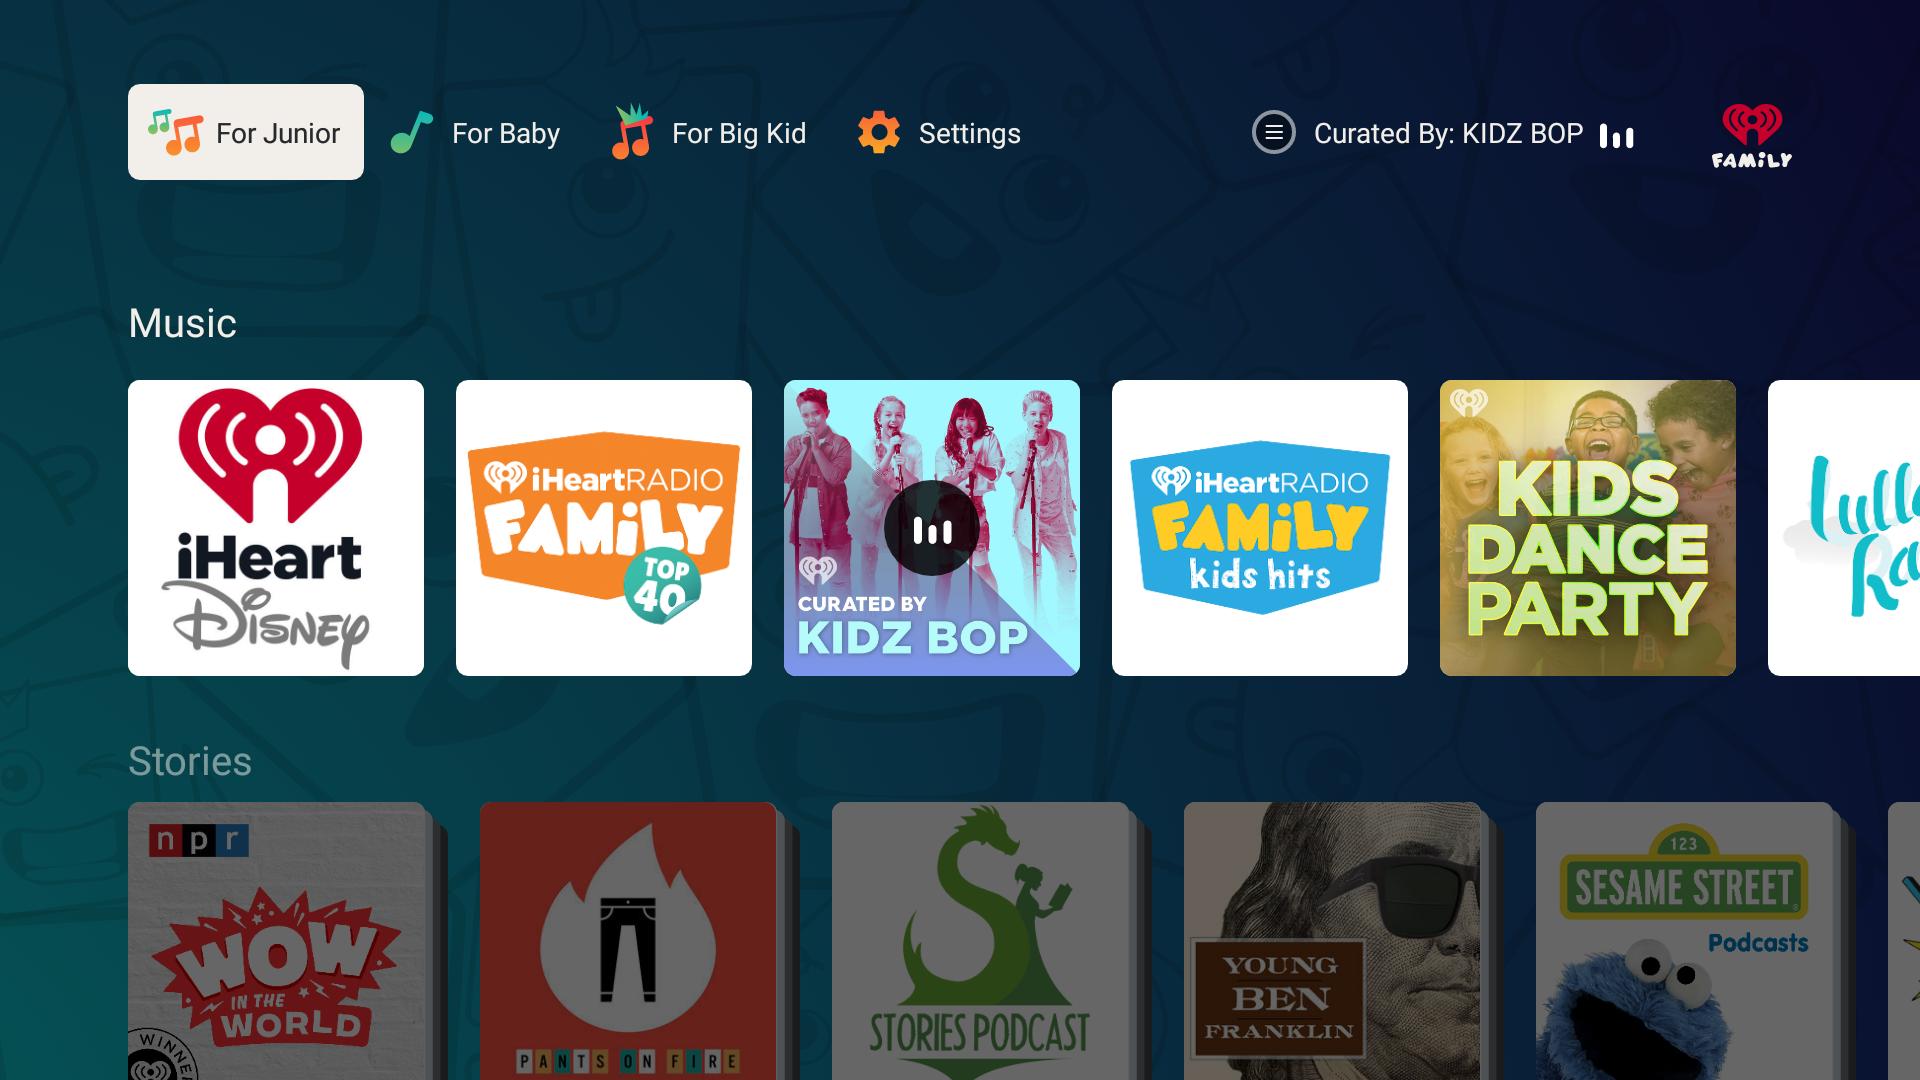 iHeartRadio Family TV